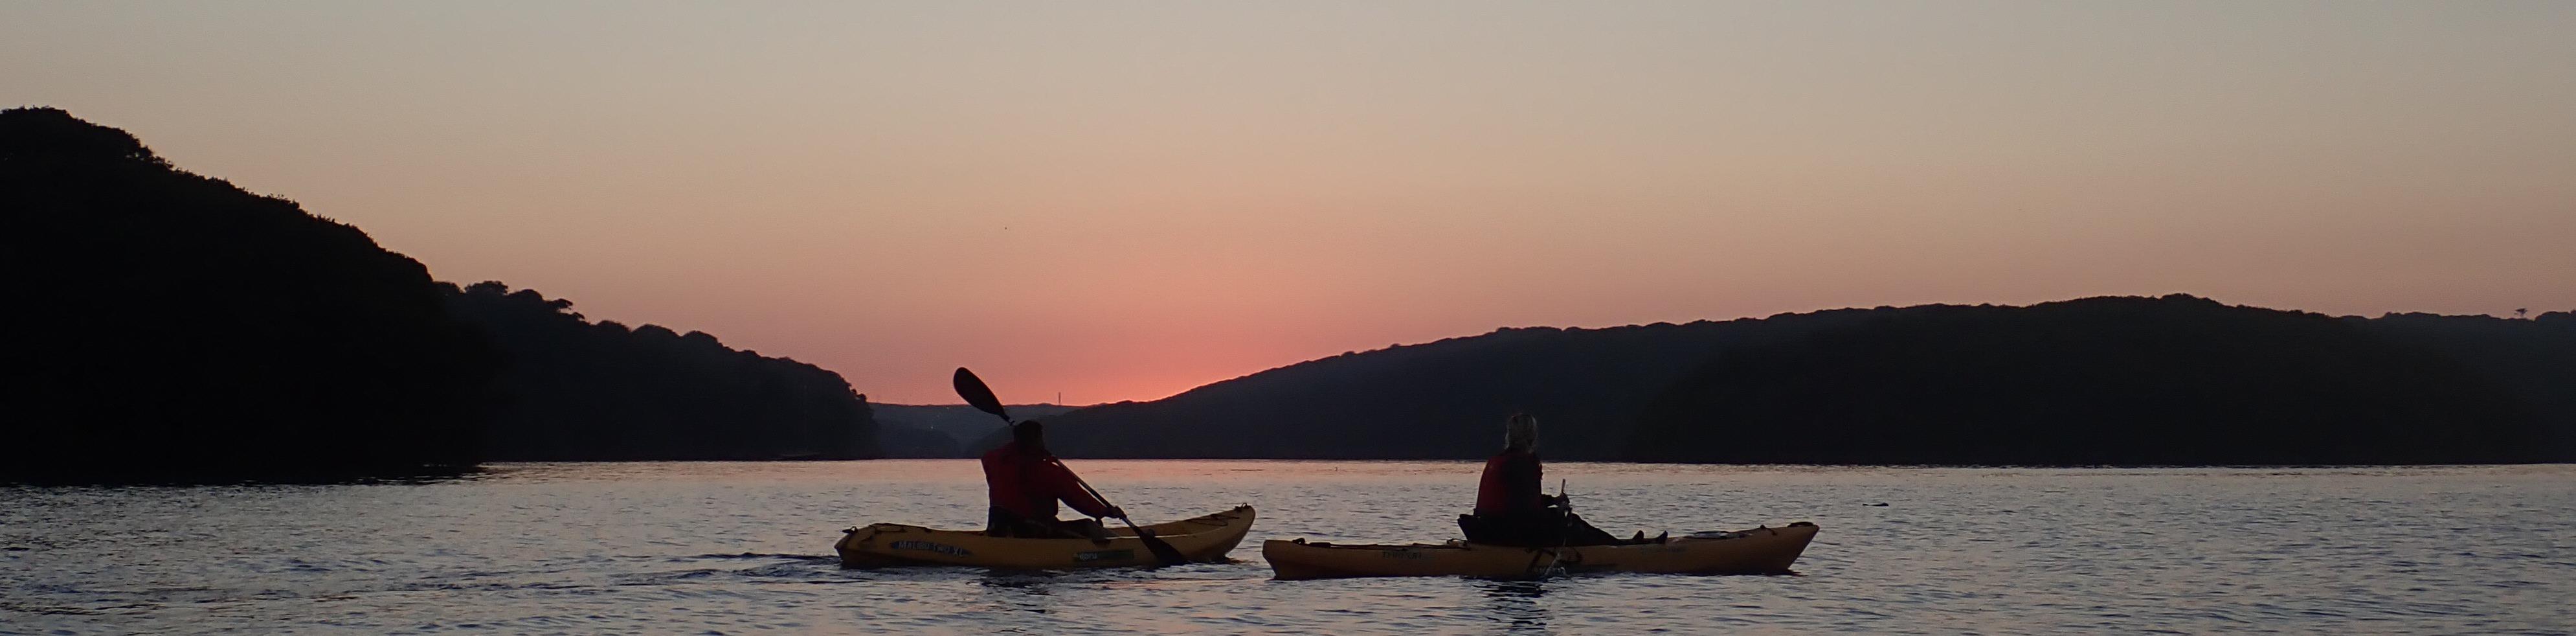 Kayak this Autumn with Koru Kayaking